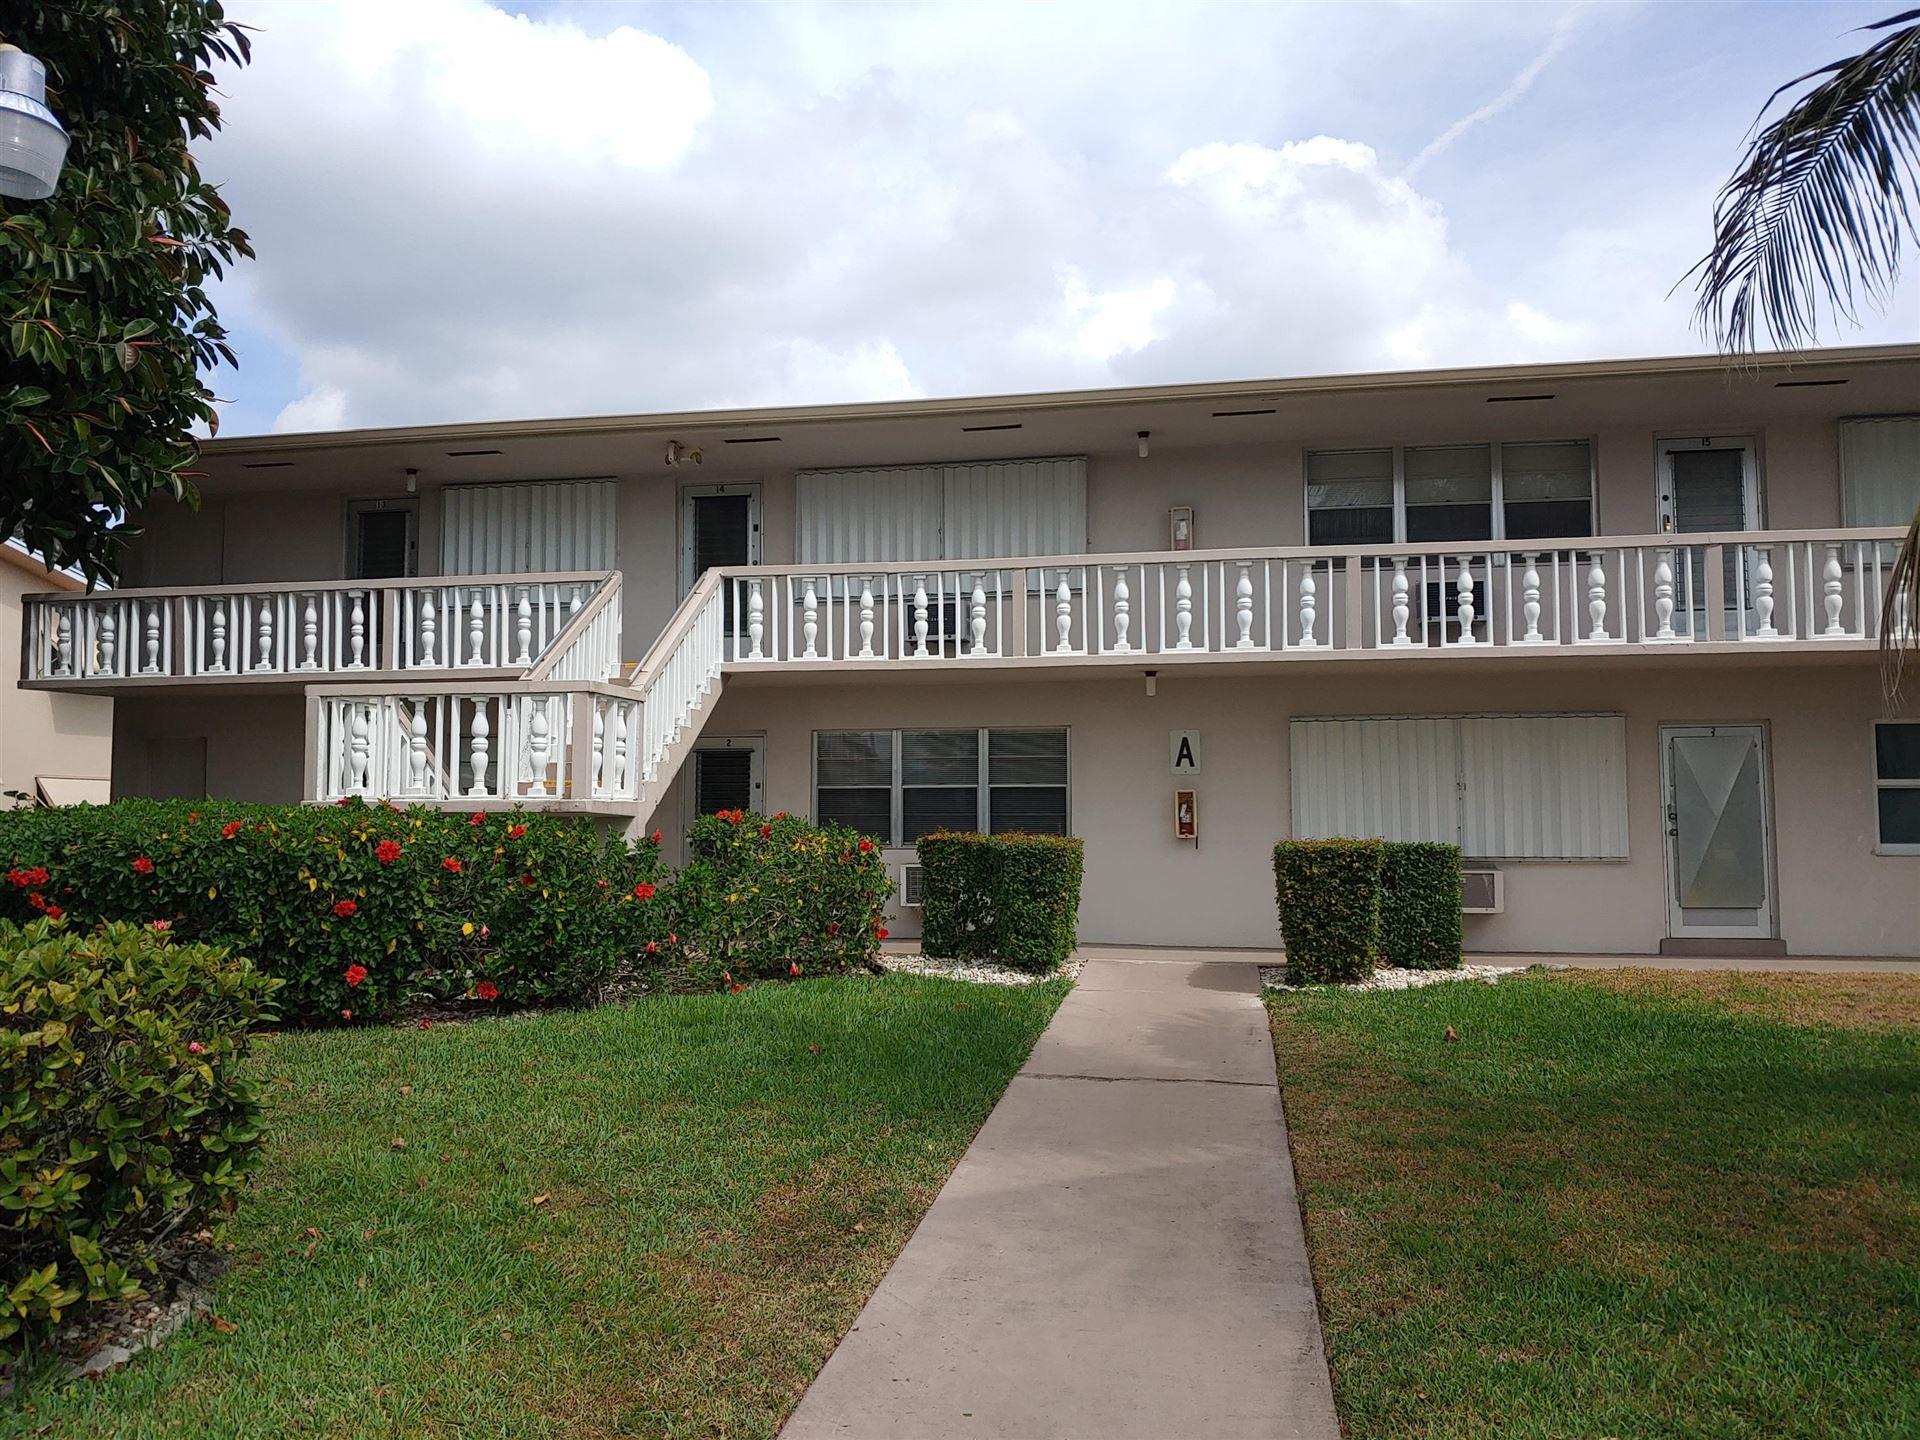 2 Easthampton A, West Palm Beach, FL 33417 - MLS#: RX-10703826